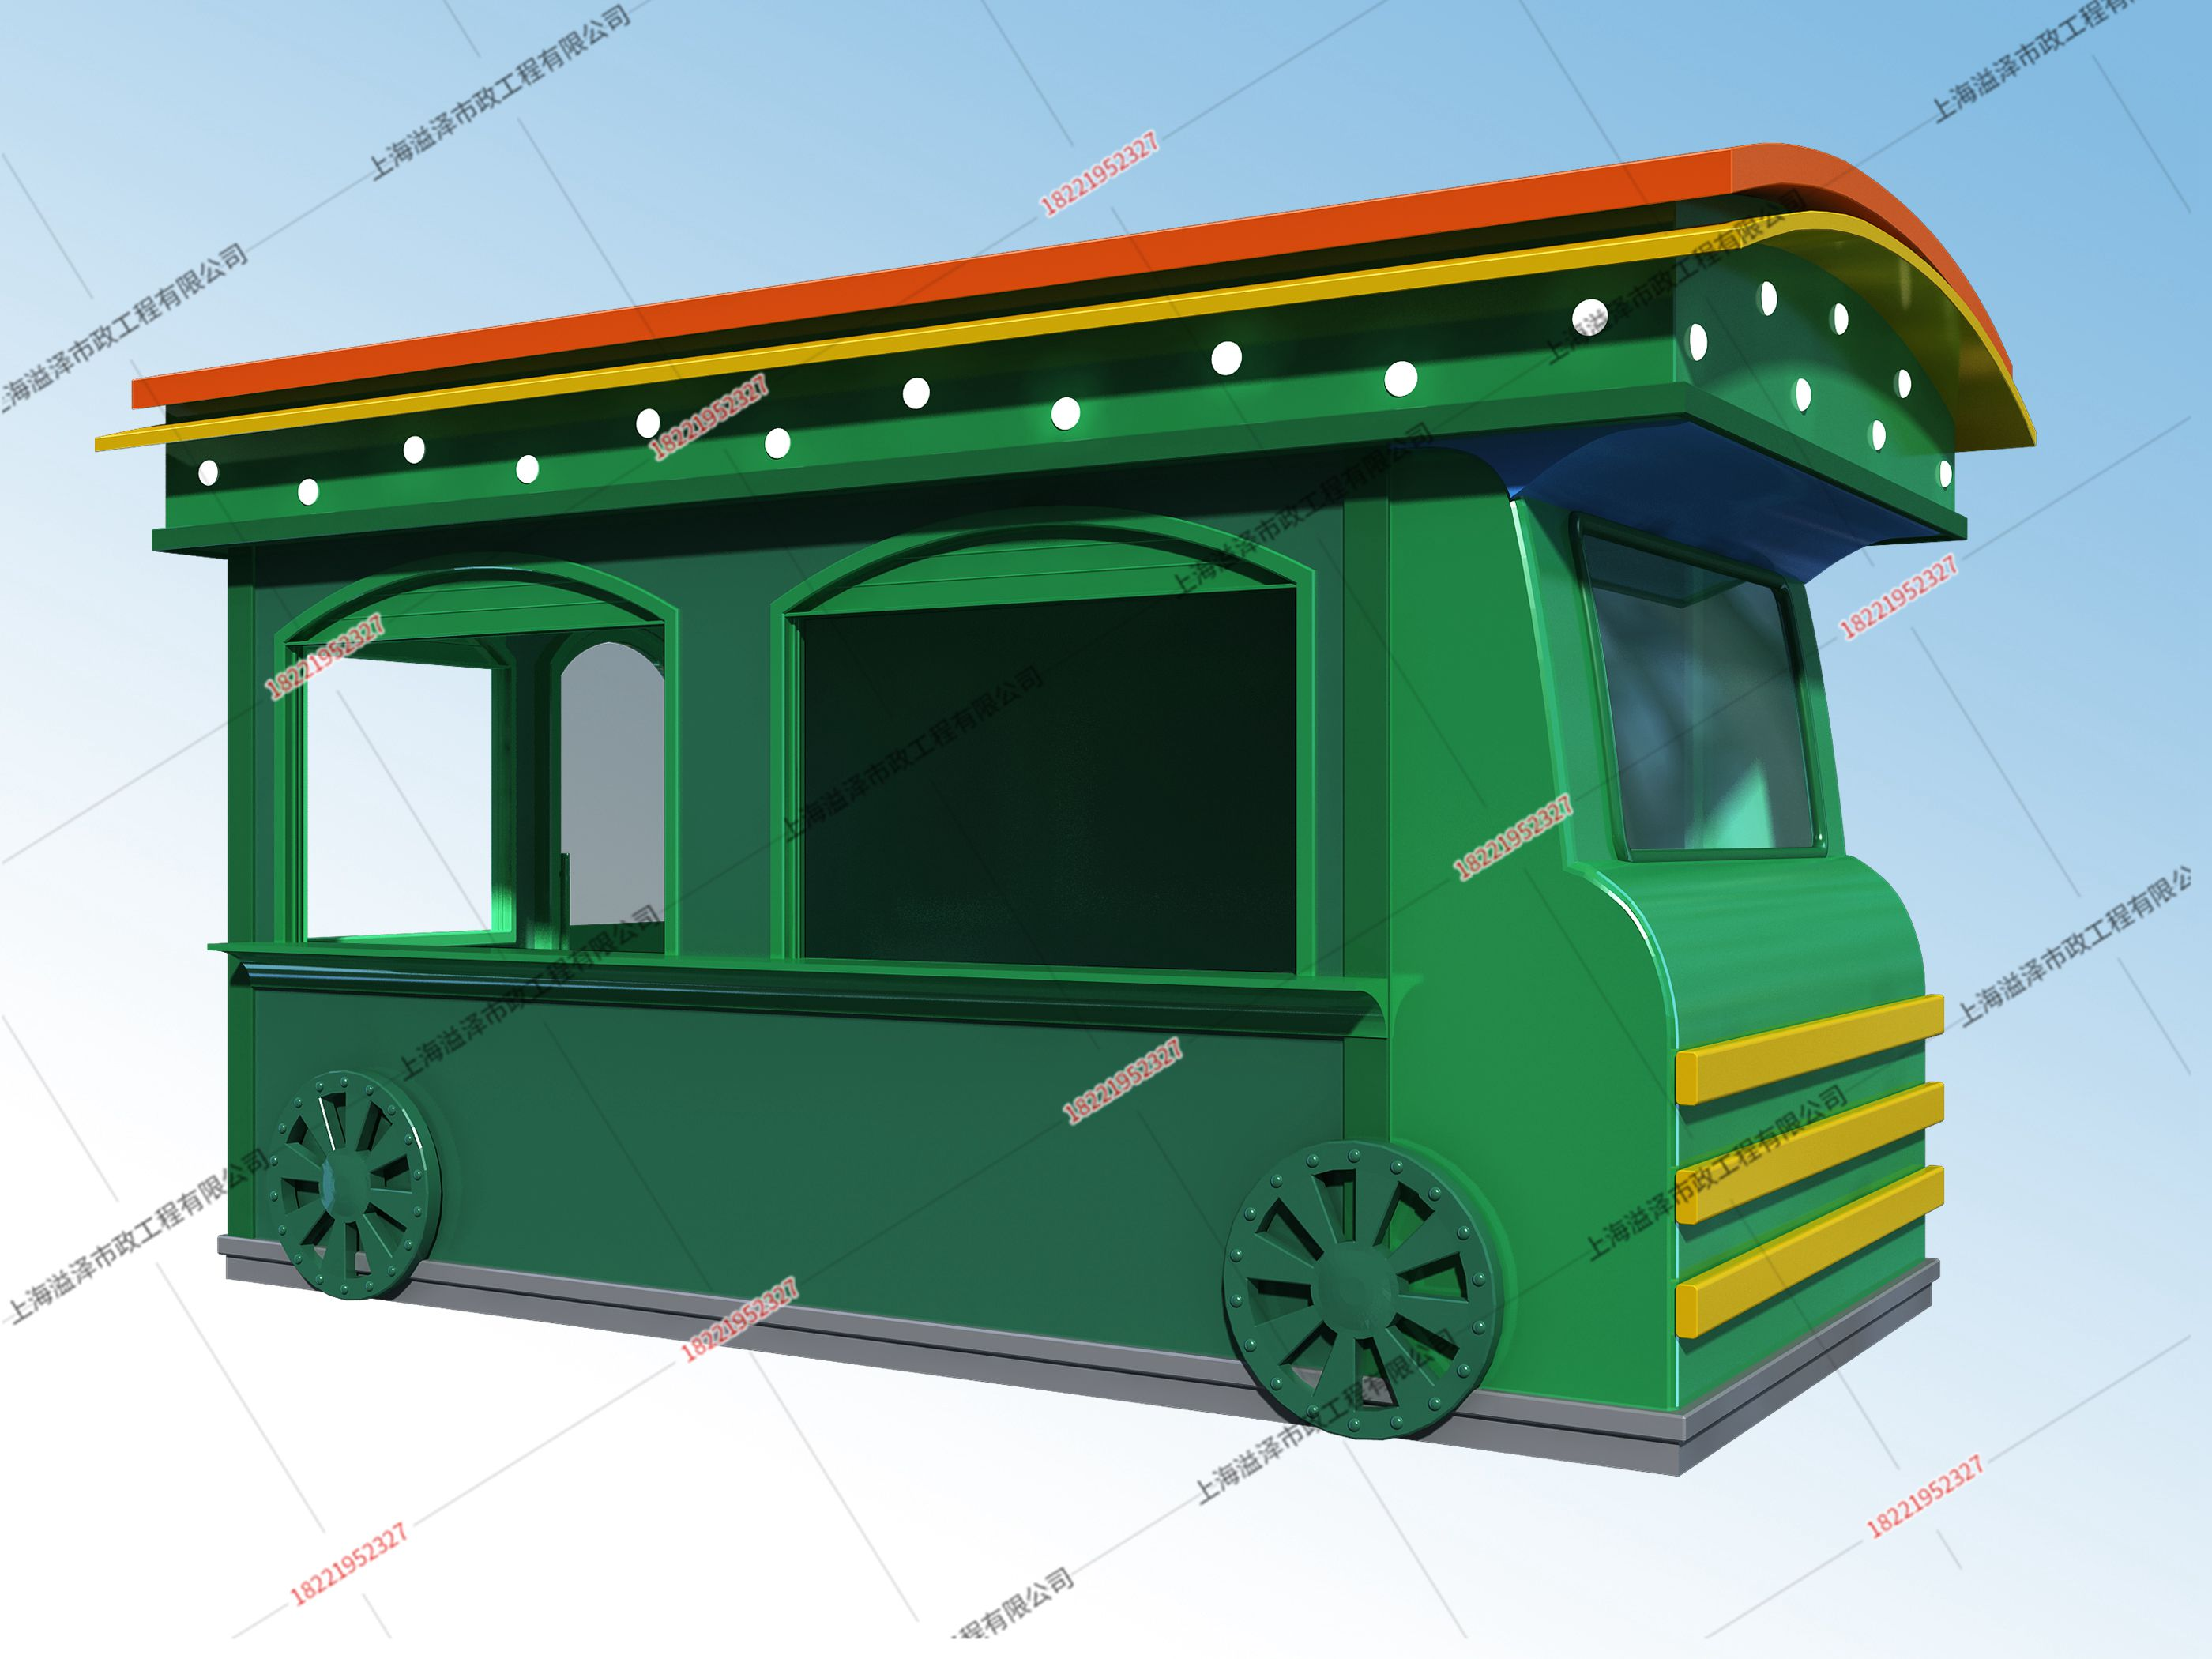 2.8x5绿色售货亭,邮亭ylxgt.d.161.1_副本.jpg